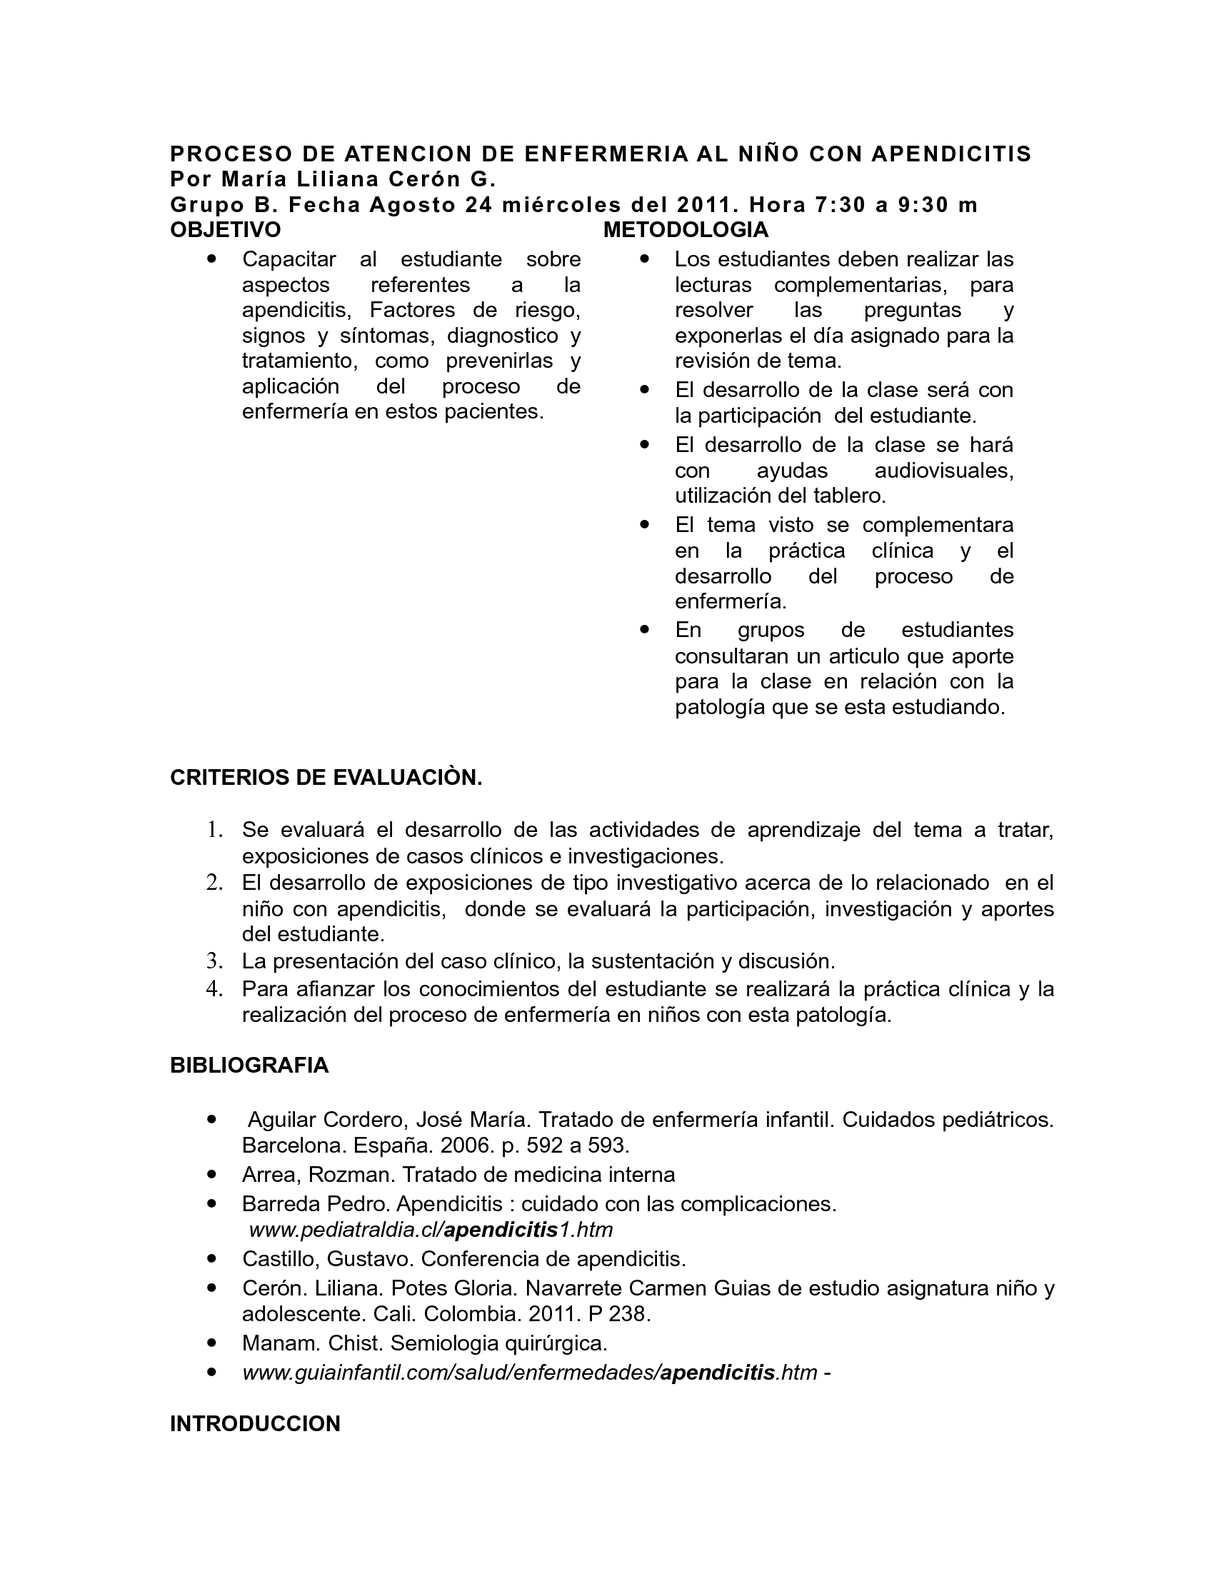 Calaméo - GUIA DE APENDICITIS